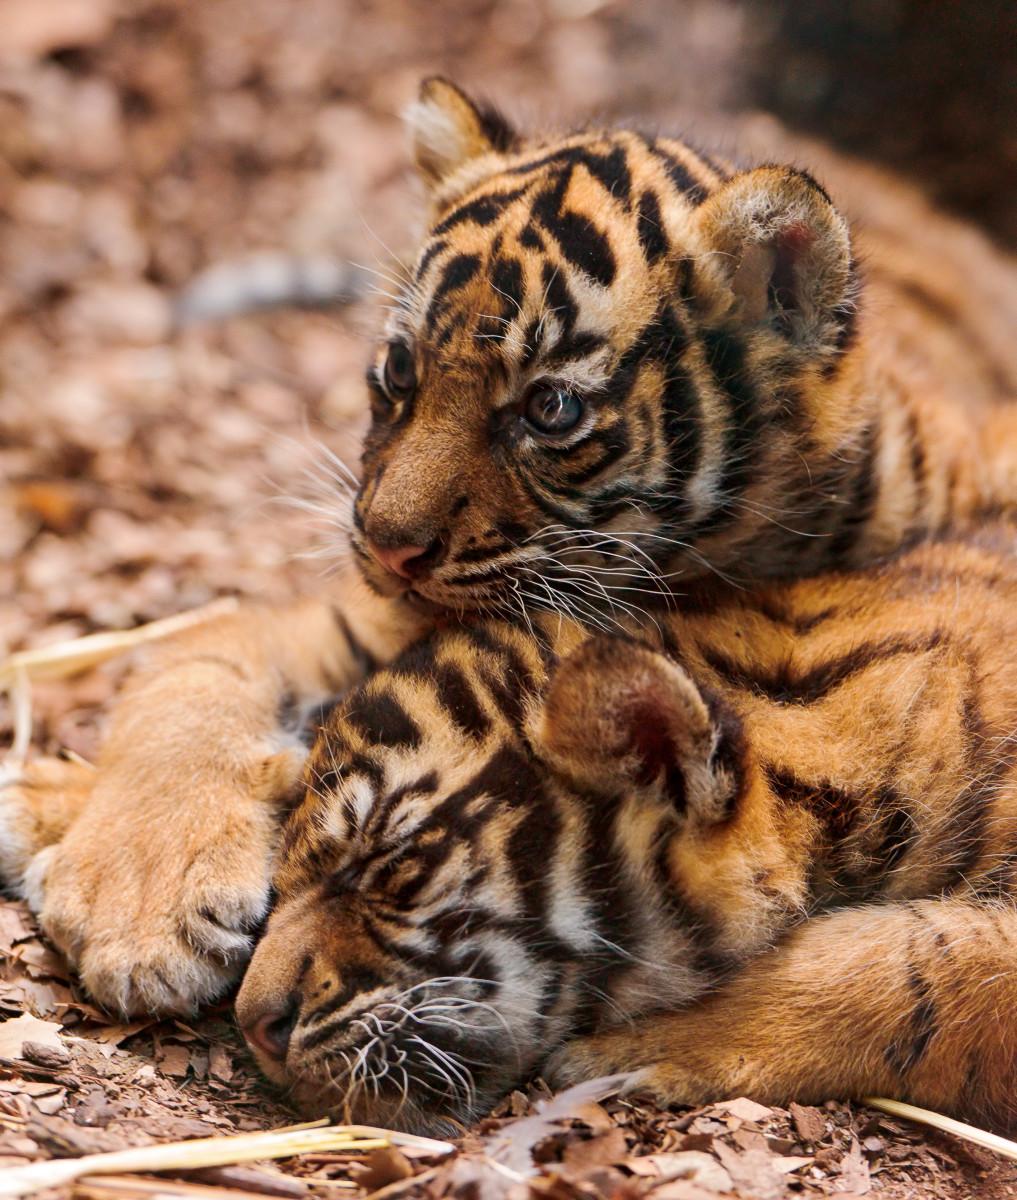 Tambako the Jaguar, CC BY-ND 2.0, via FlickrSumatran tiger cubs at the Frankfurt Zoo in Germany